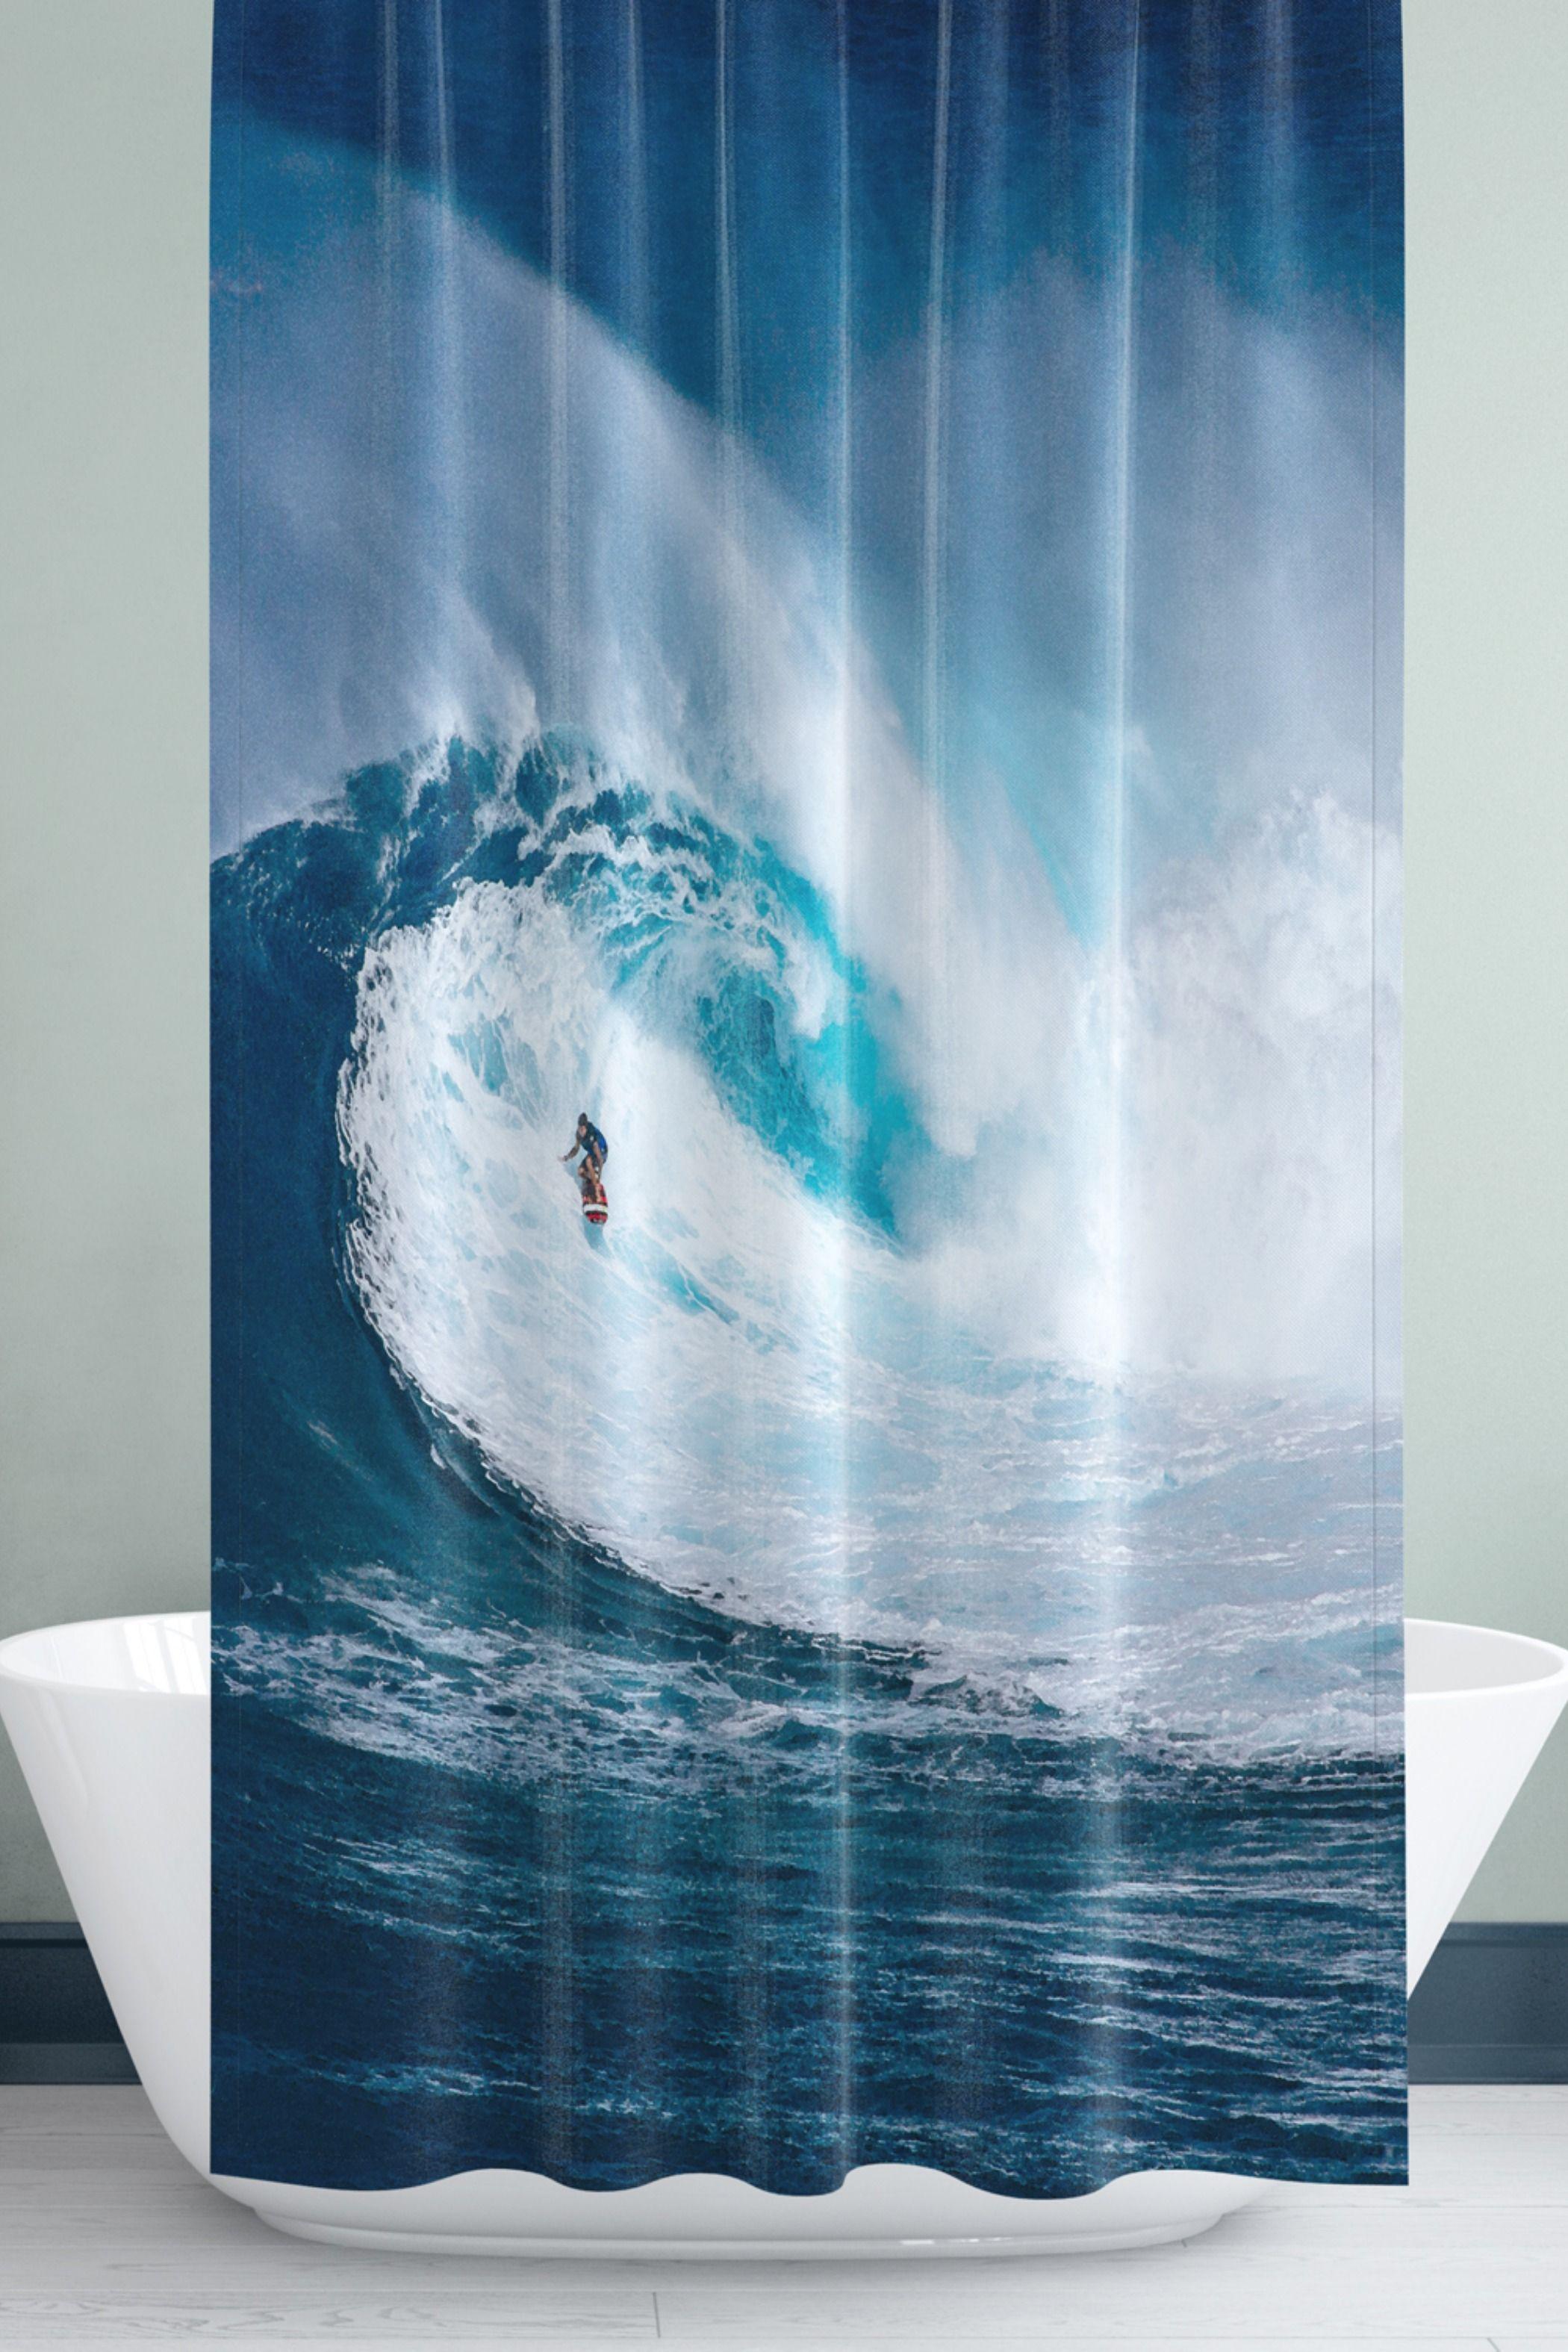 Surfing Shower Curtain Etsy Surfer Decor Curtains Brown